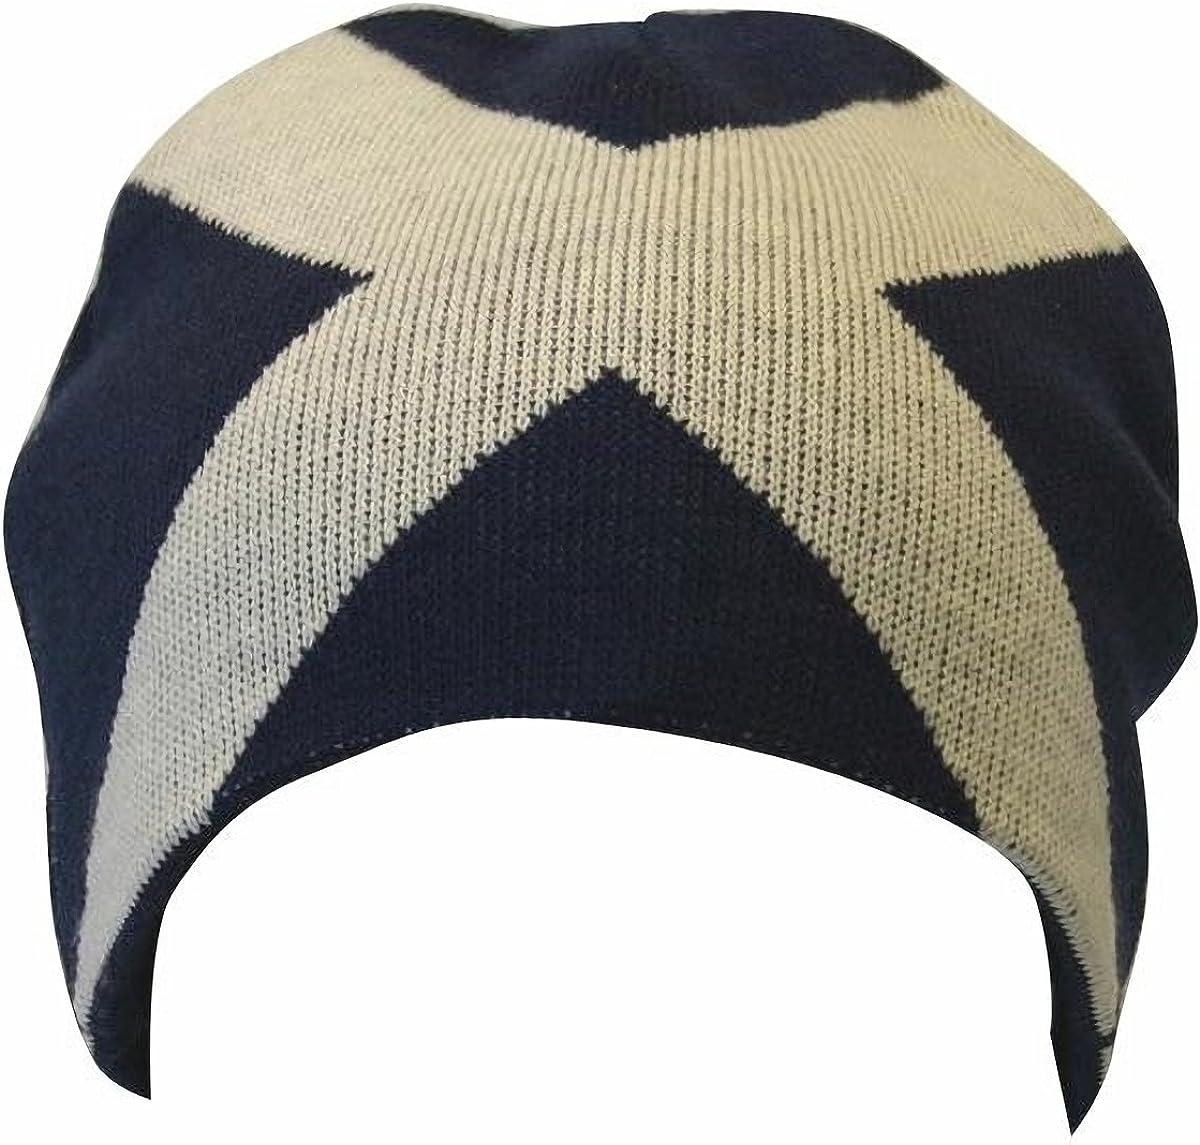 Gorro Beanie de invierno Diseño Cruz de Escocia para hombre ...